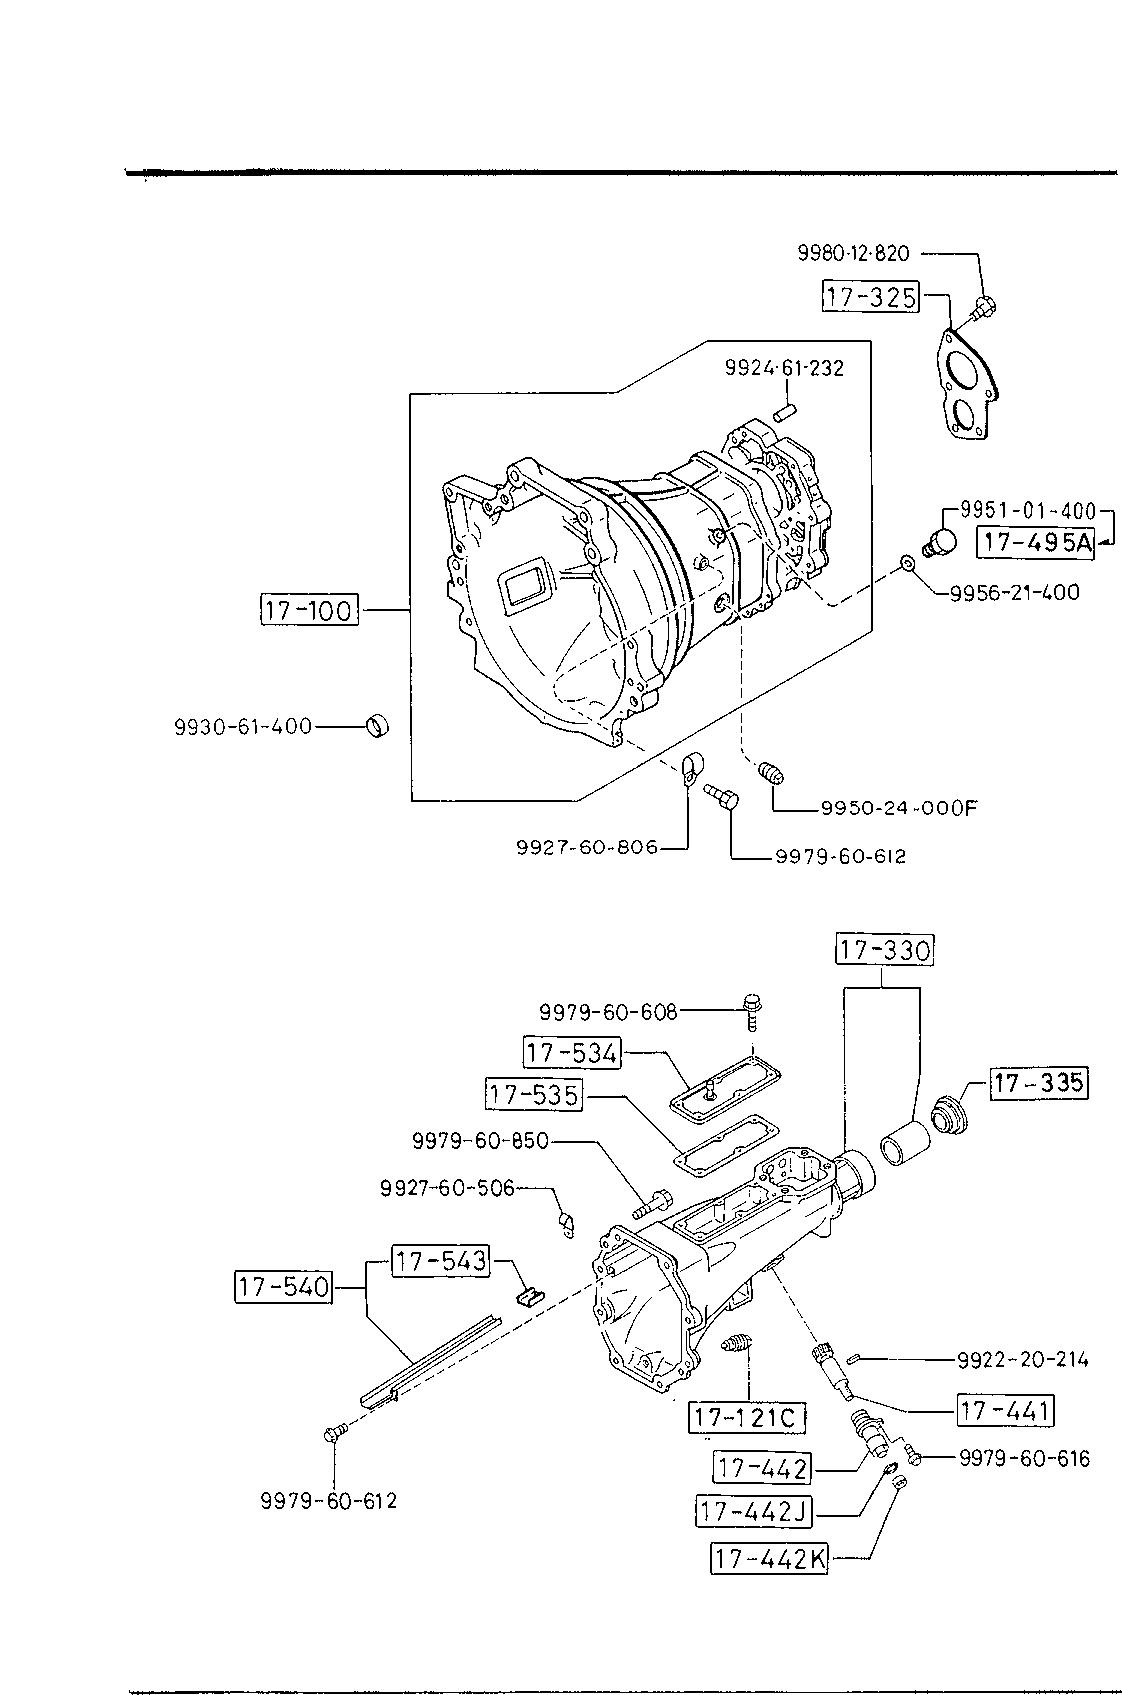 USA, 1987 B2000, GASOLINE-ENGINE & TRANSMISSION, 1700 - MANUAL TRANSMISSION  CASE (4-SPEED) - Catcar.infoCATCAR.INFO